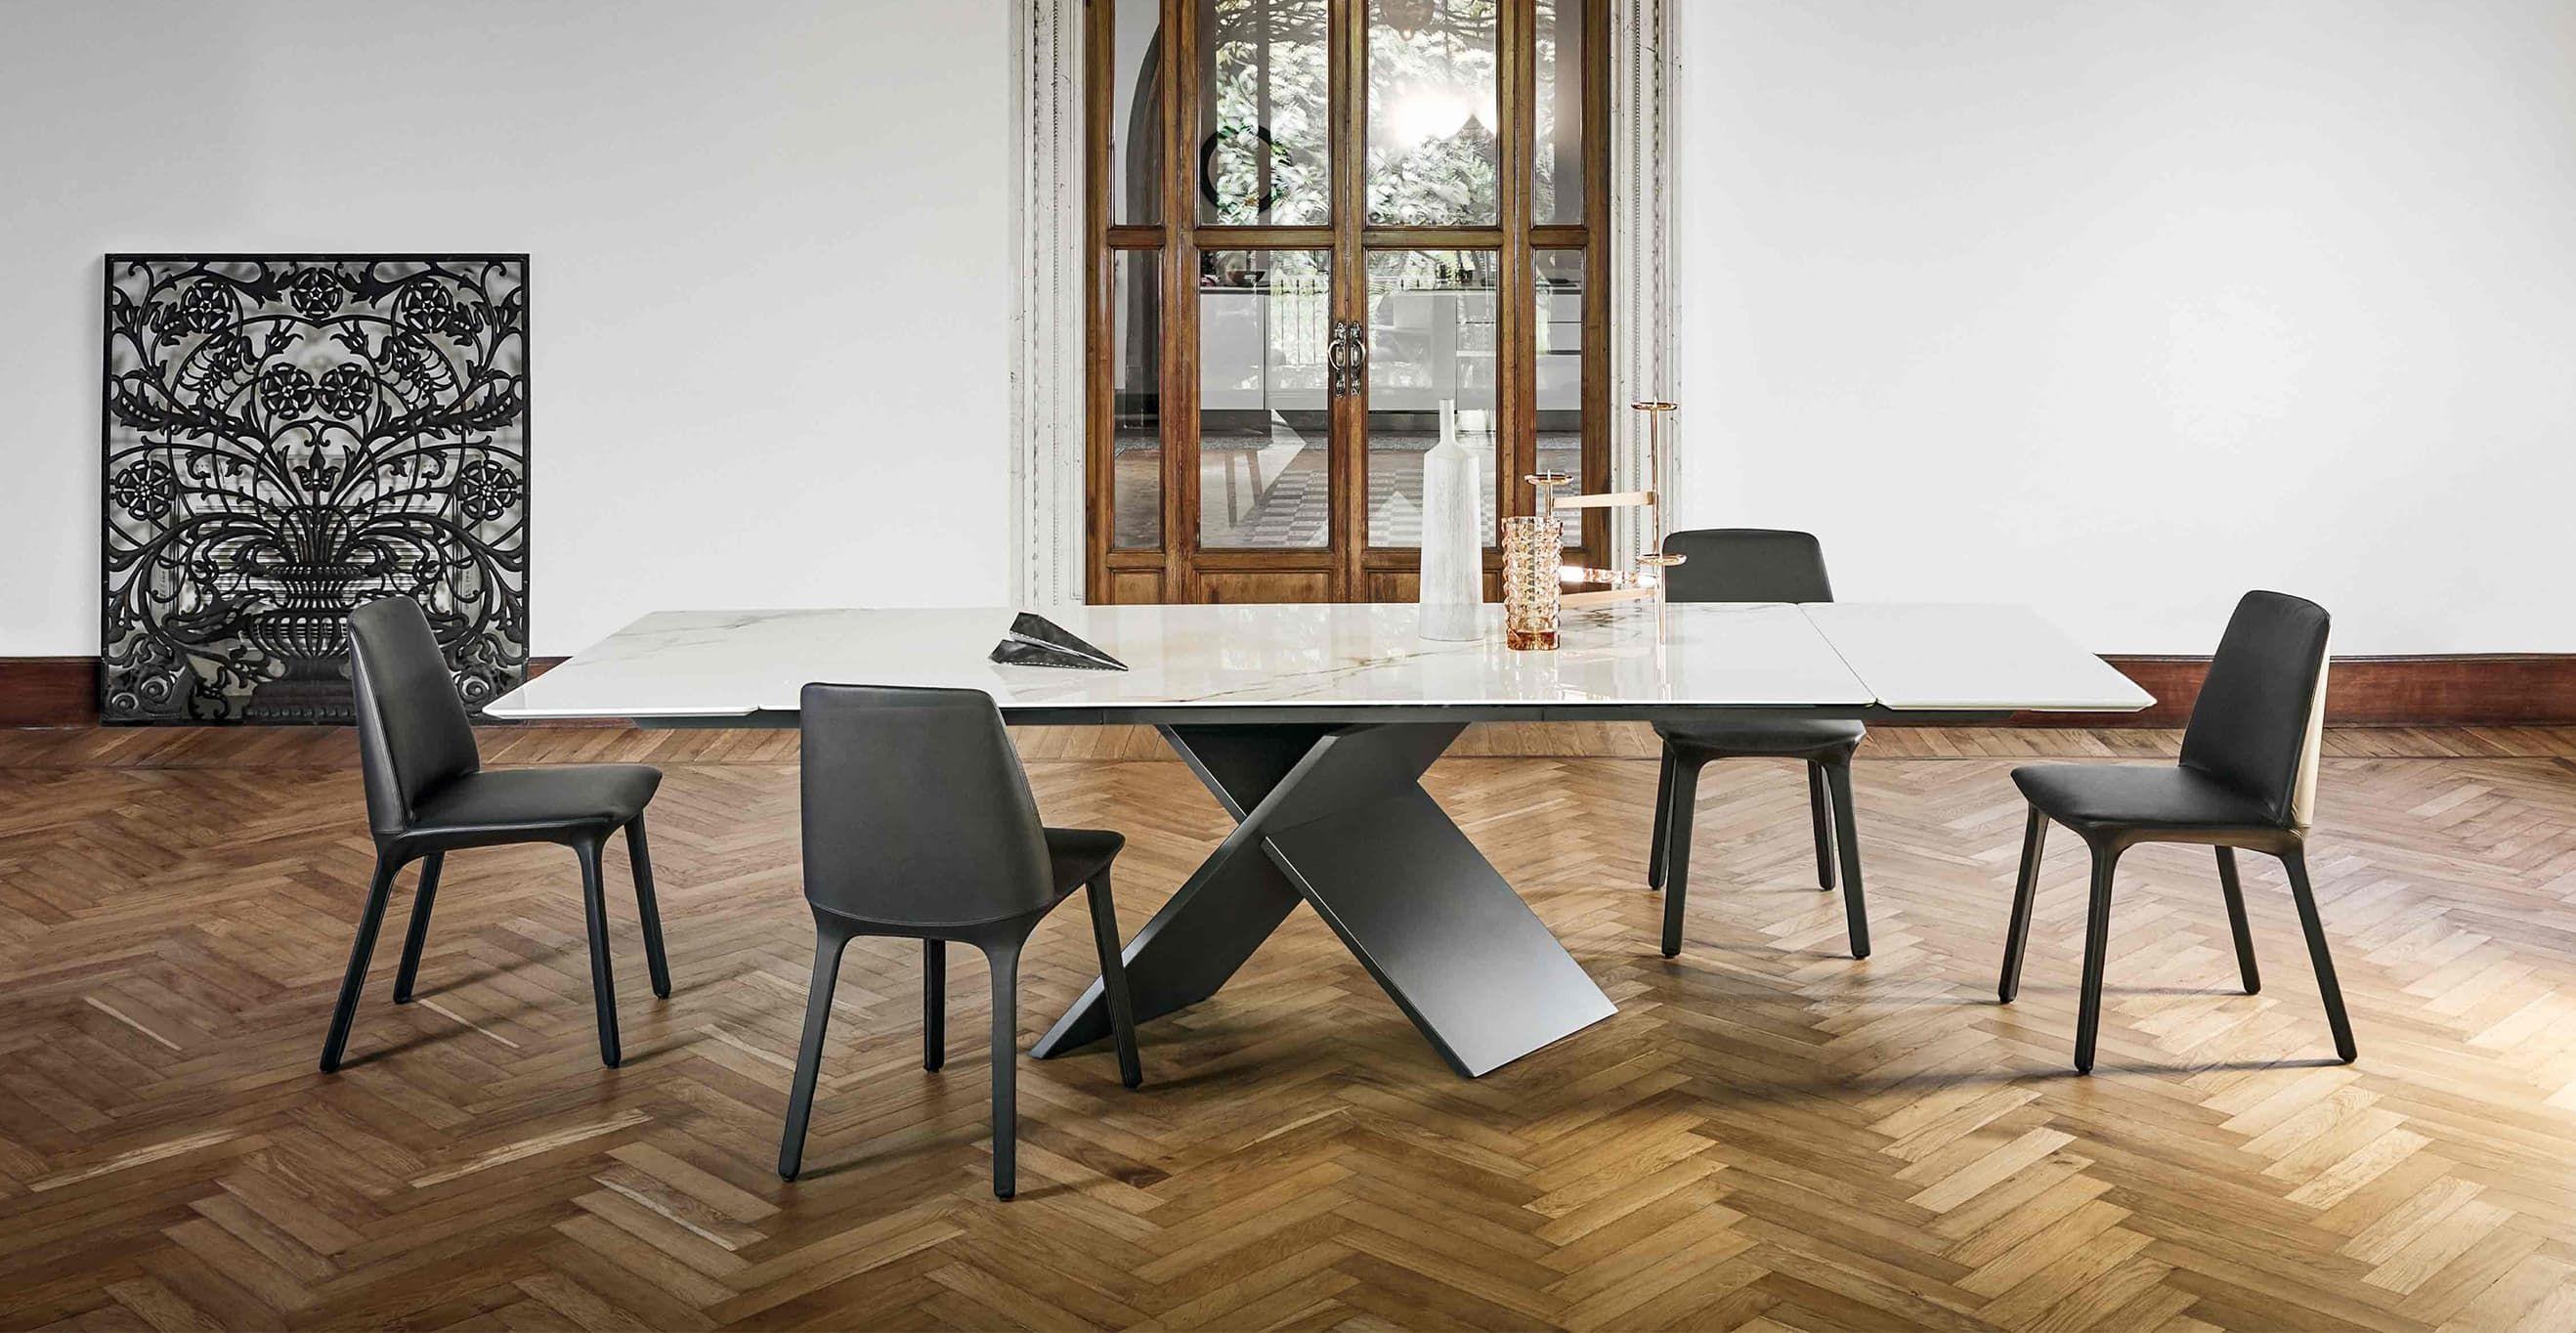 Ax Bonaldo Table Extendable In 2020 Ceramic Dining Table Dining Table Price Italian Dining Table